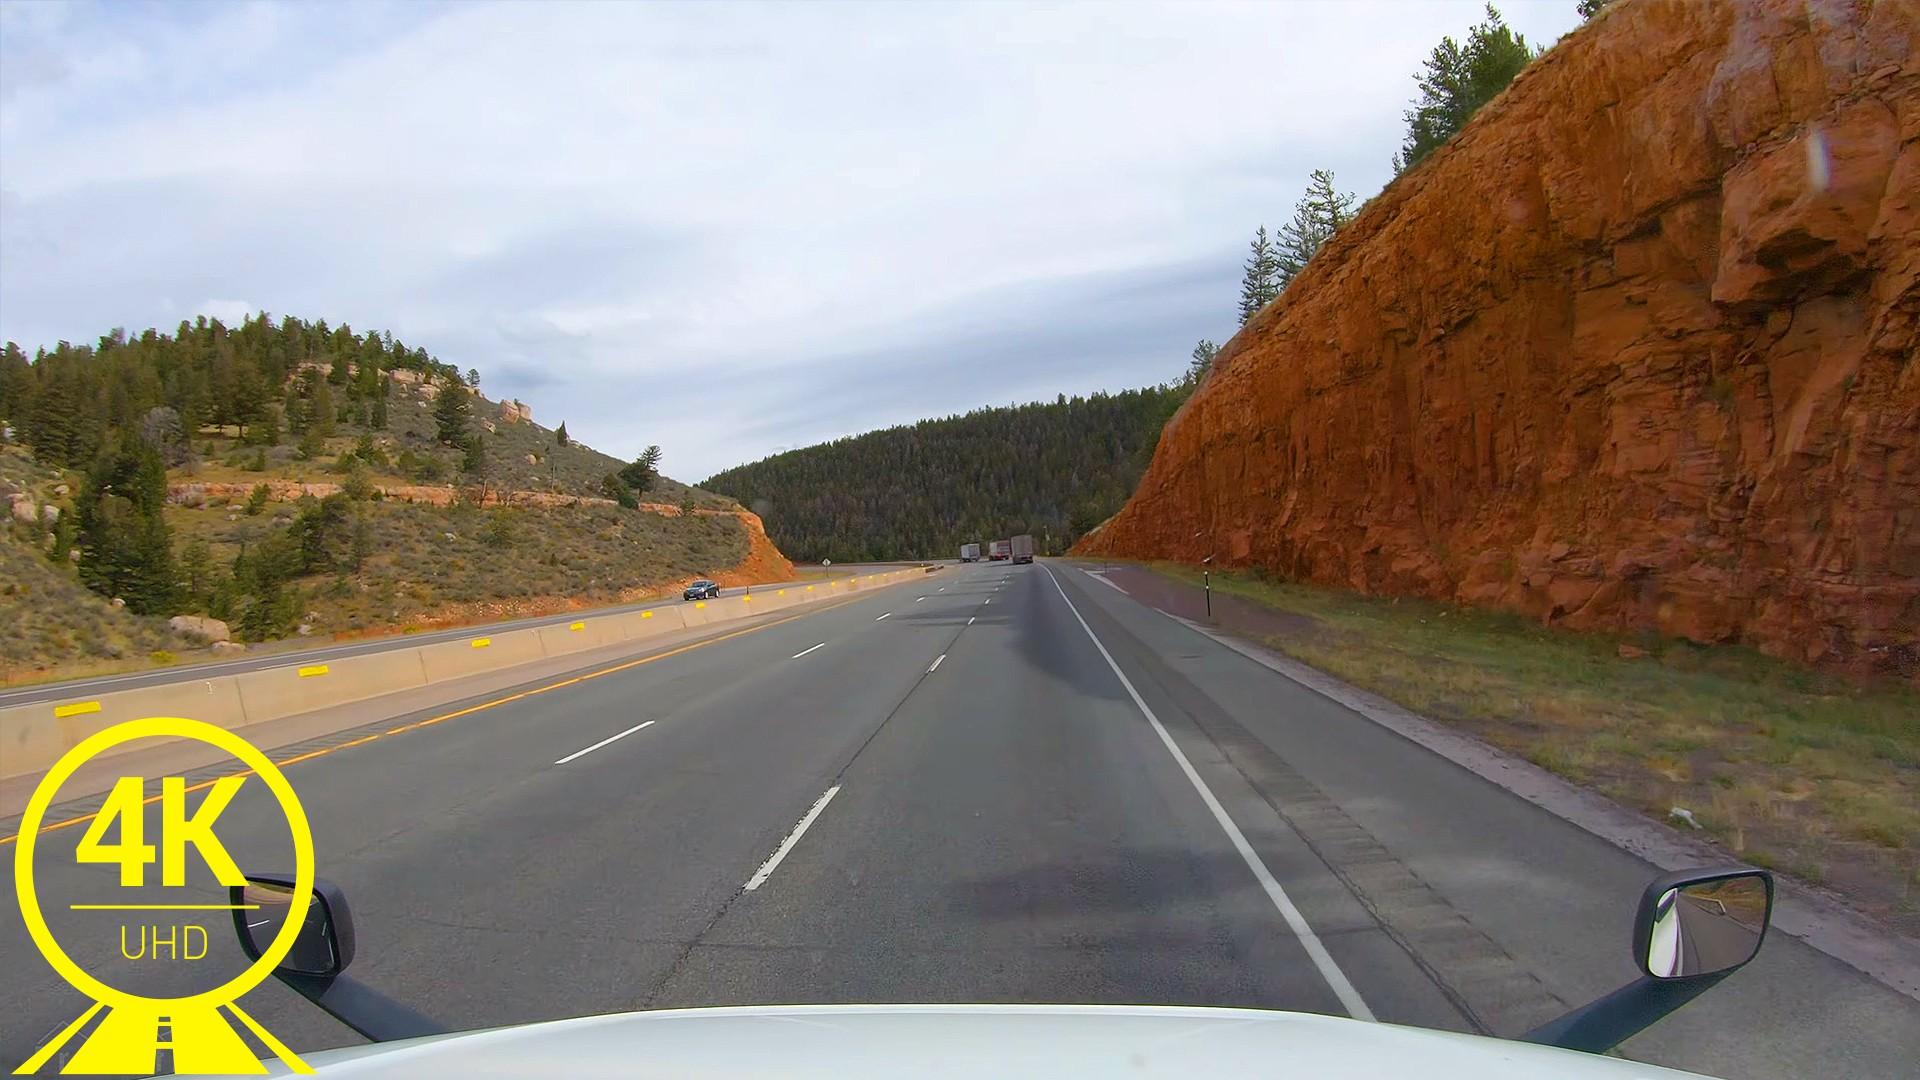 American Roads by Truck PART 7